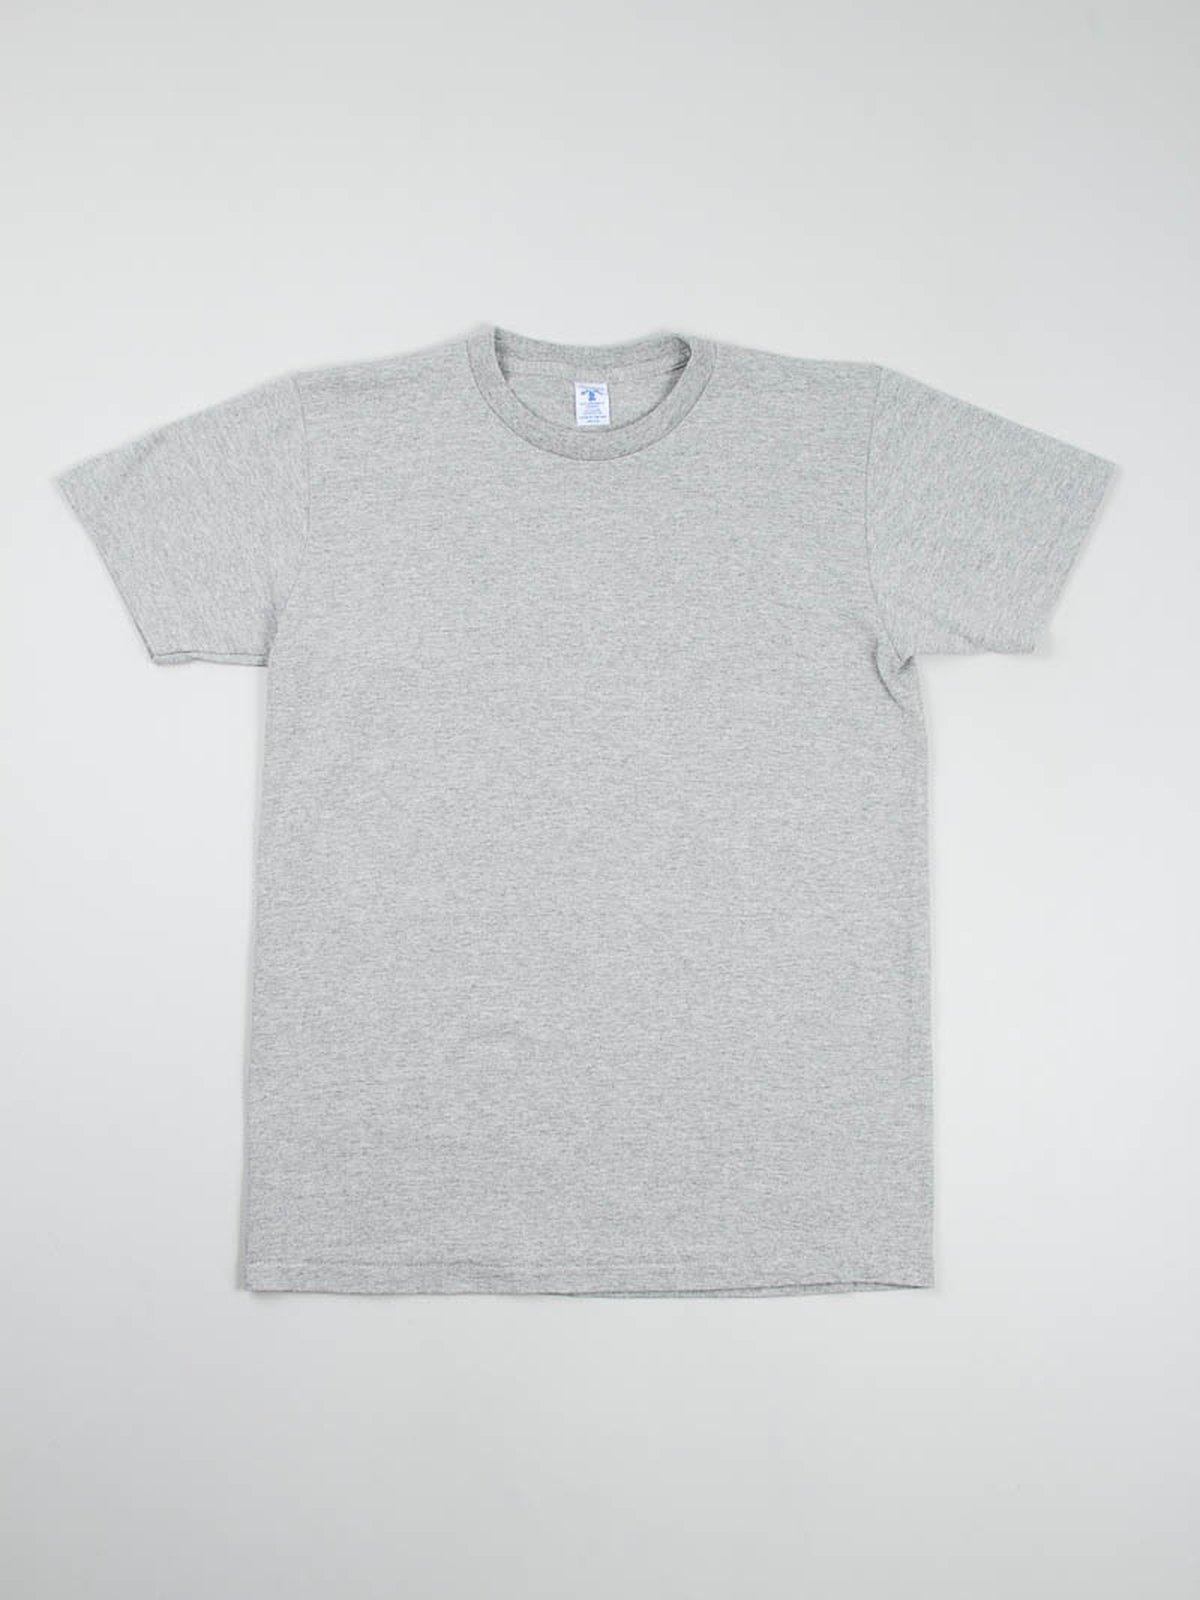 White/Heather Grey 2–Pac Plain Tees - Image 2